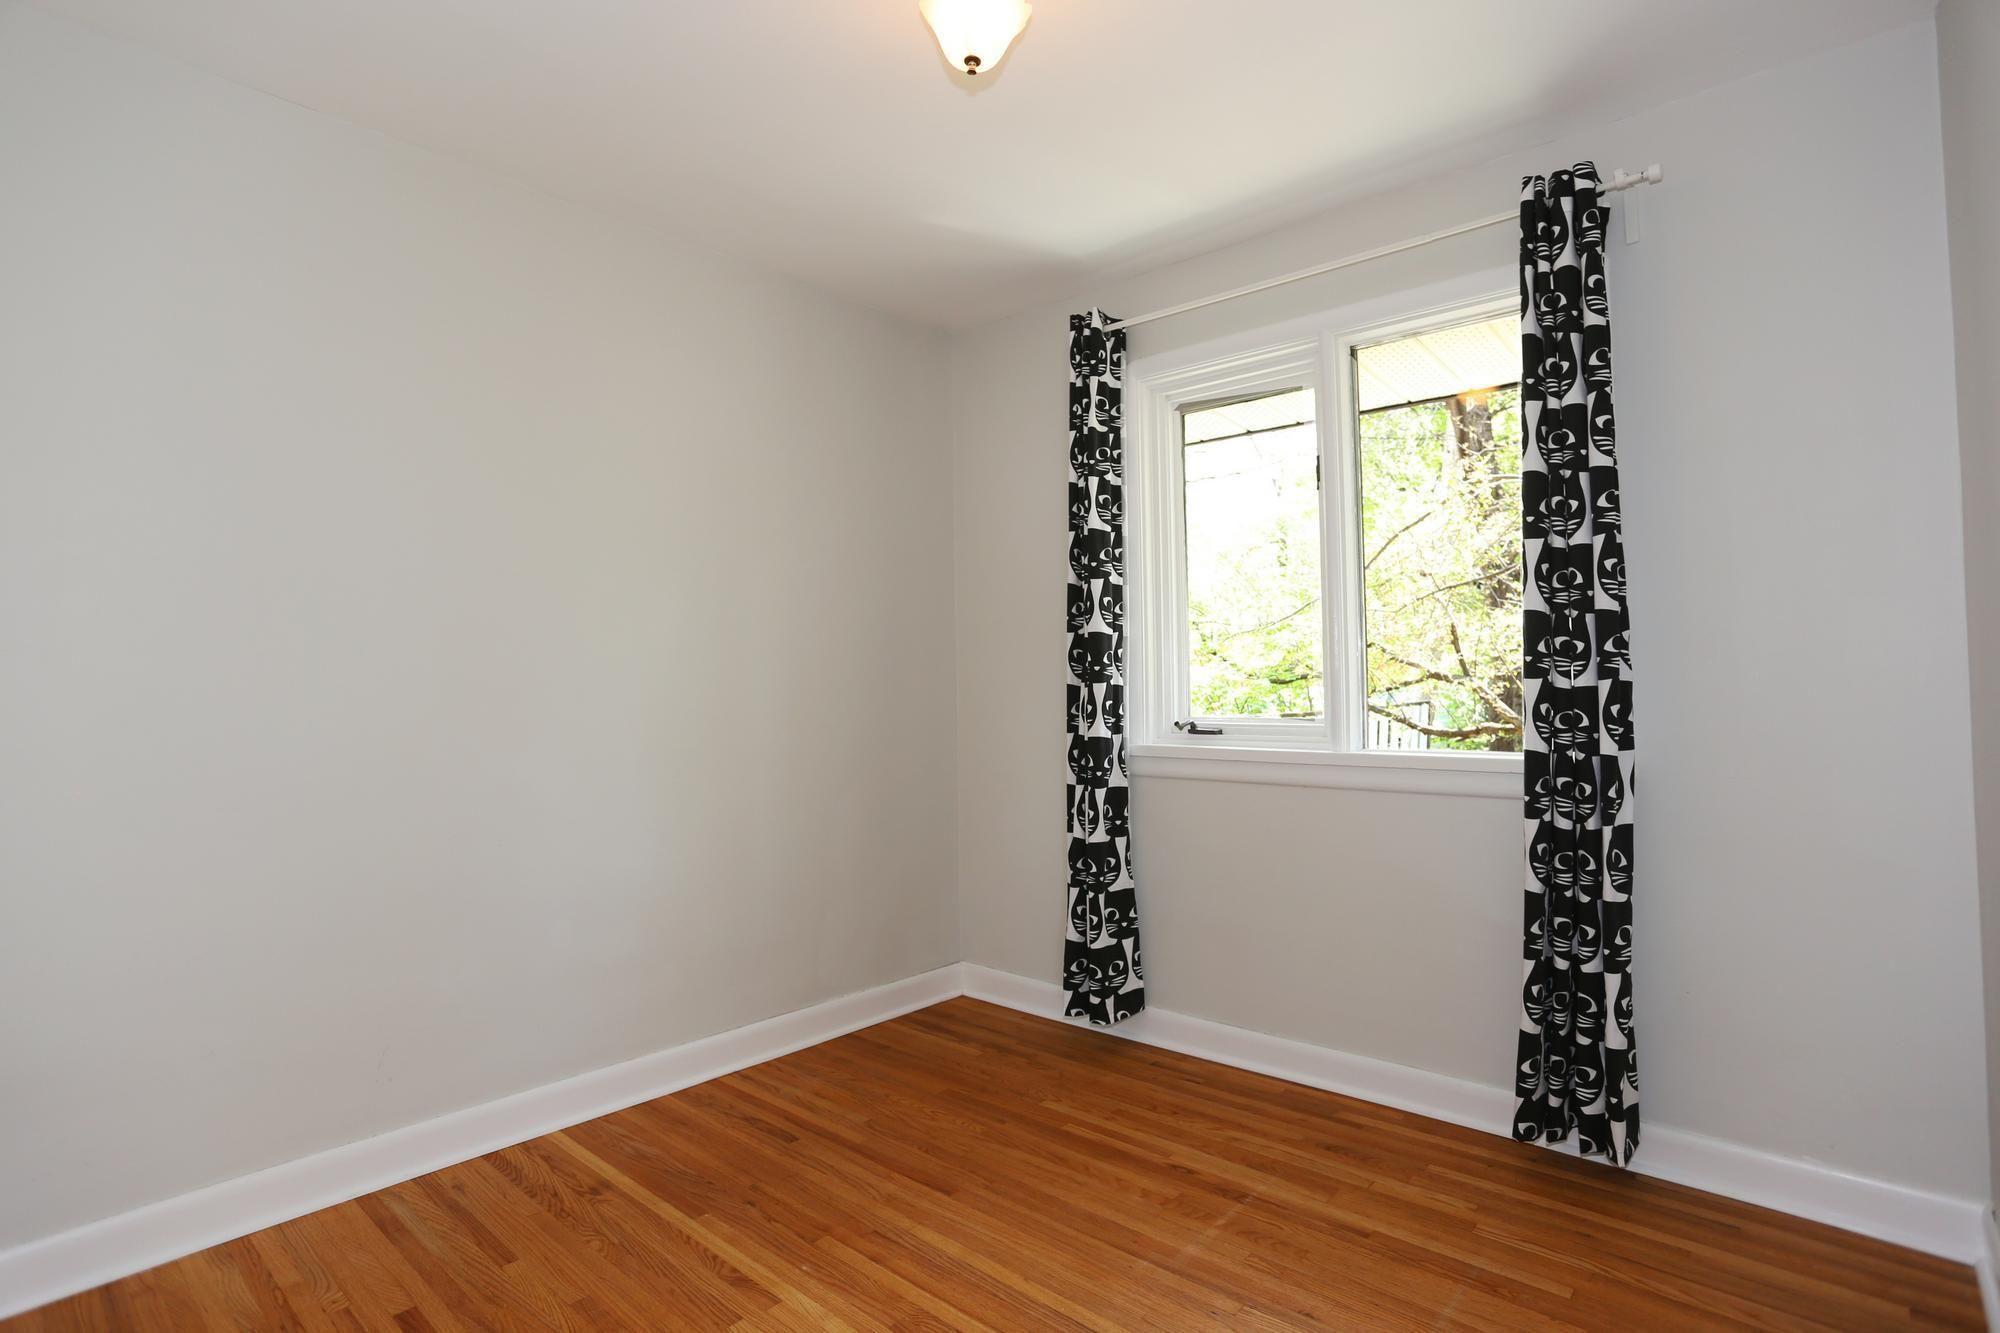 Photo 17: Photos: 290 McLeod Avenue in Winnipeg: North Kildonan Single Family Detached for sale (3F)  : MLS®# 1814938